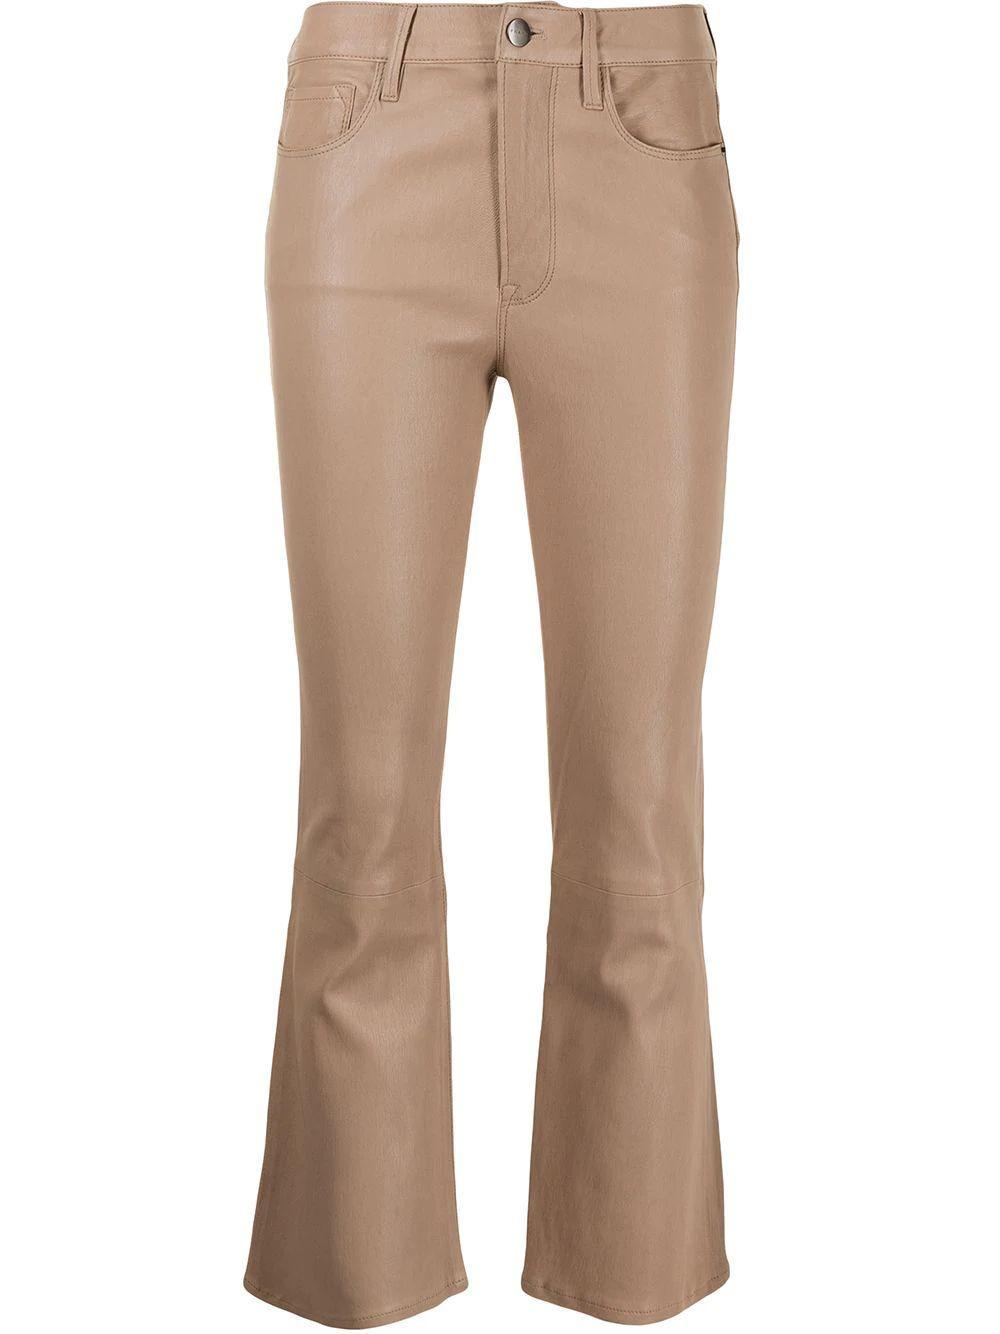 Le Crop Mini Boot Cut Leather Pant Item # LWLT0495